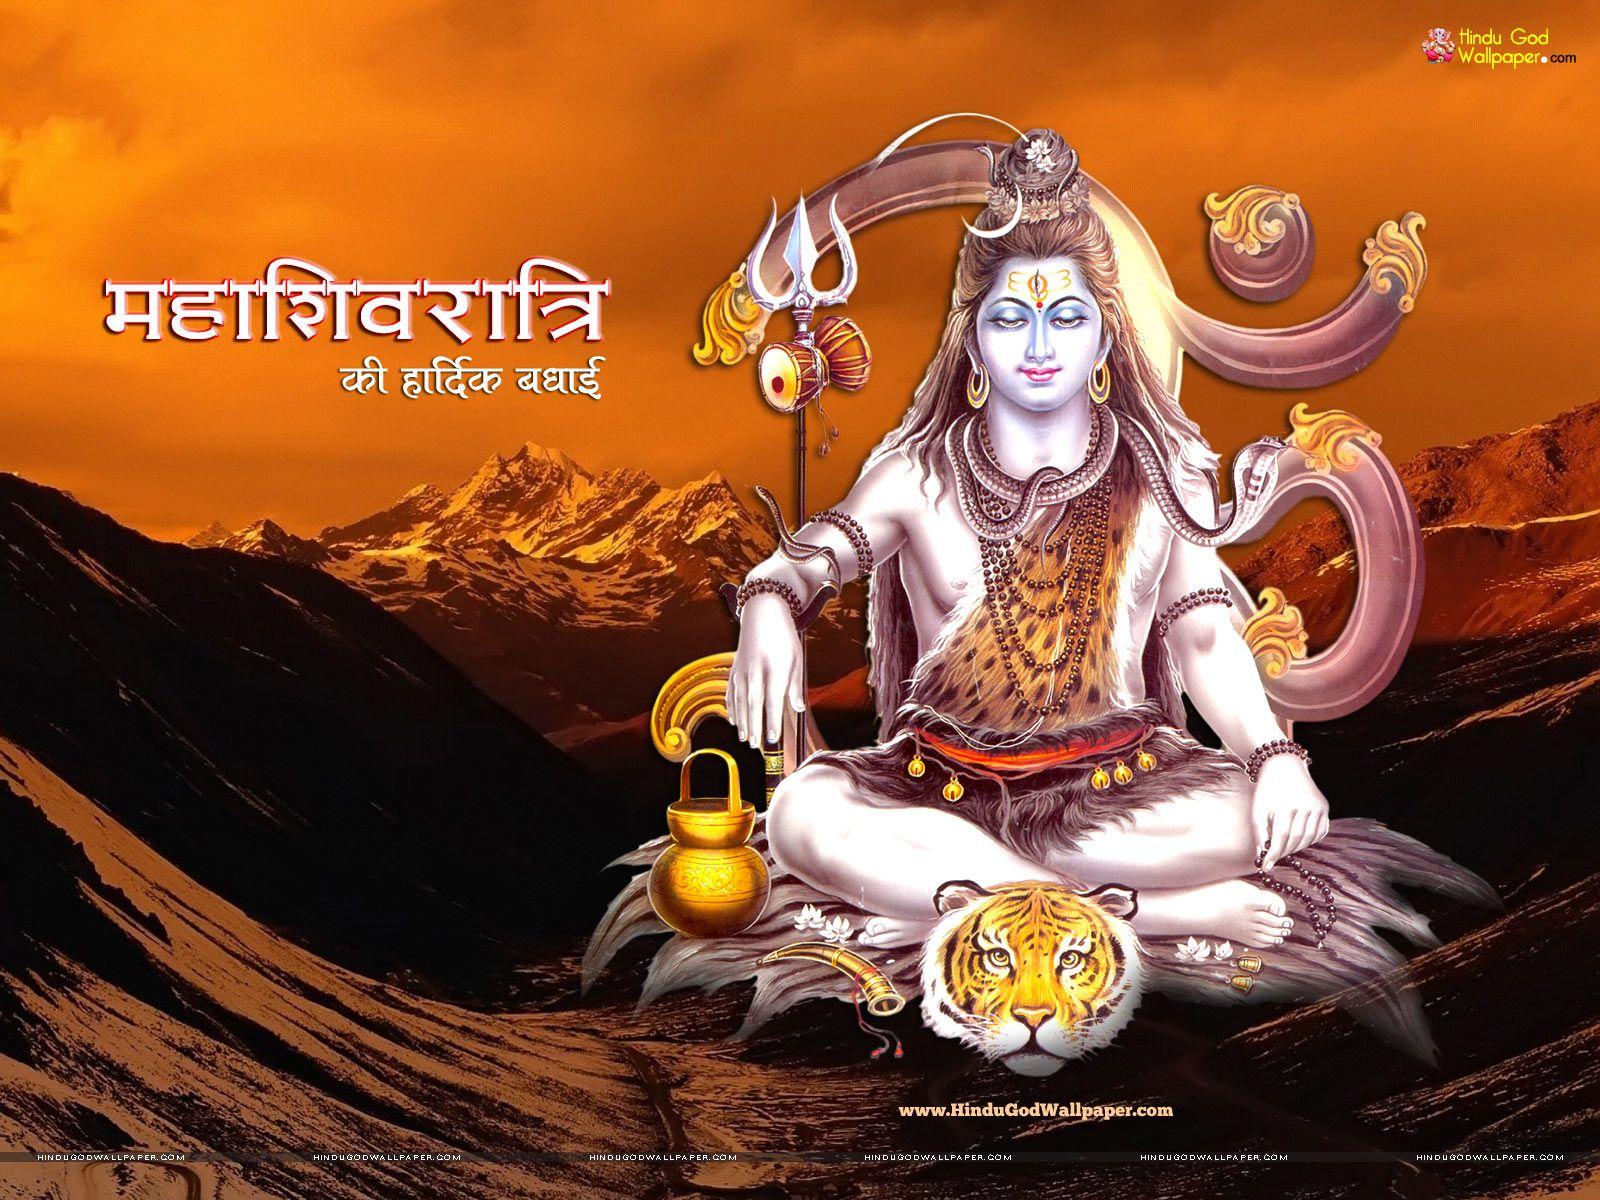 Shivaratri Wallpapers Mahashivratri Wallpapers Download